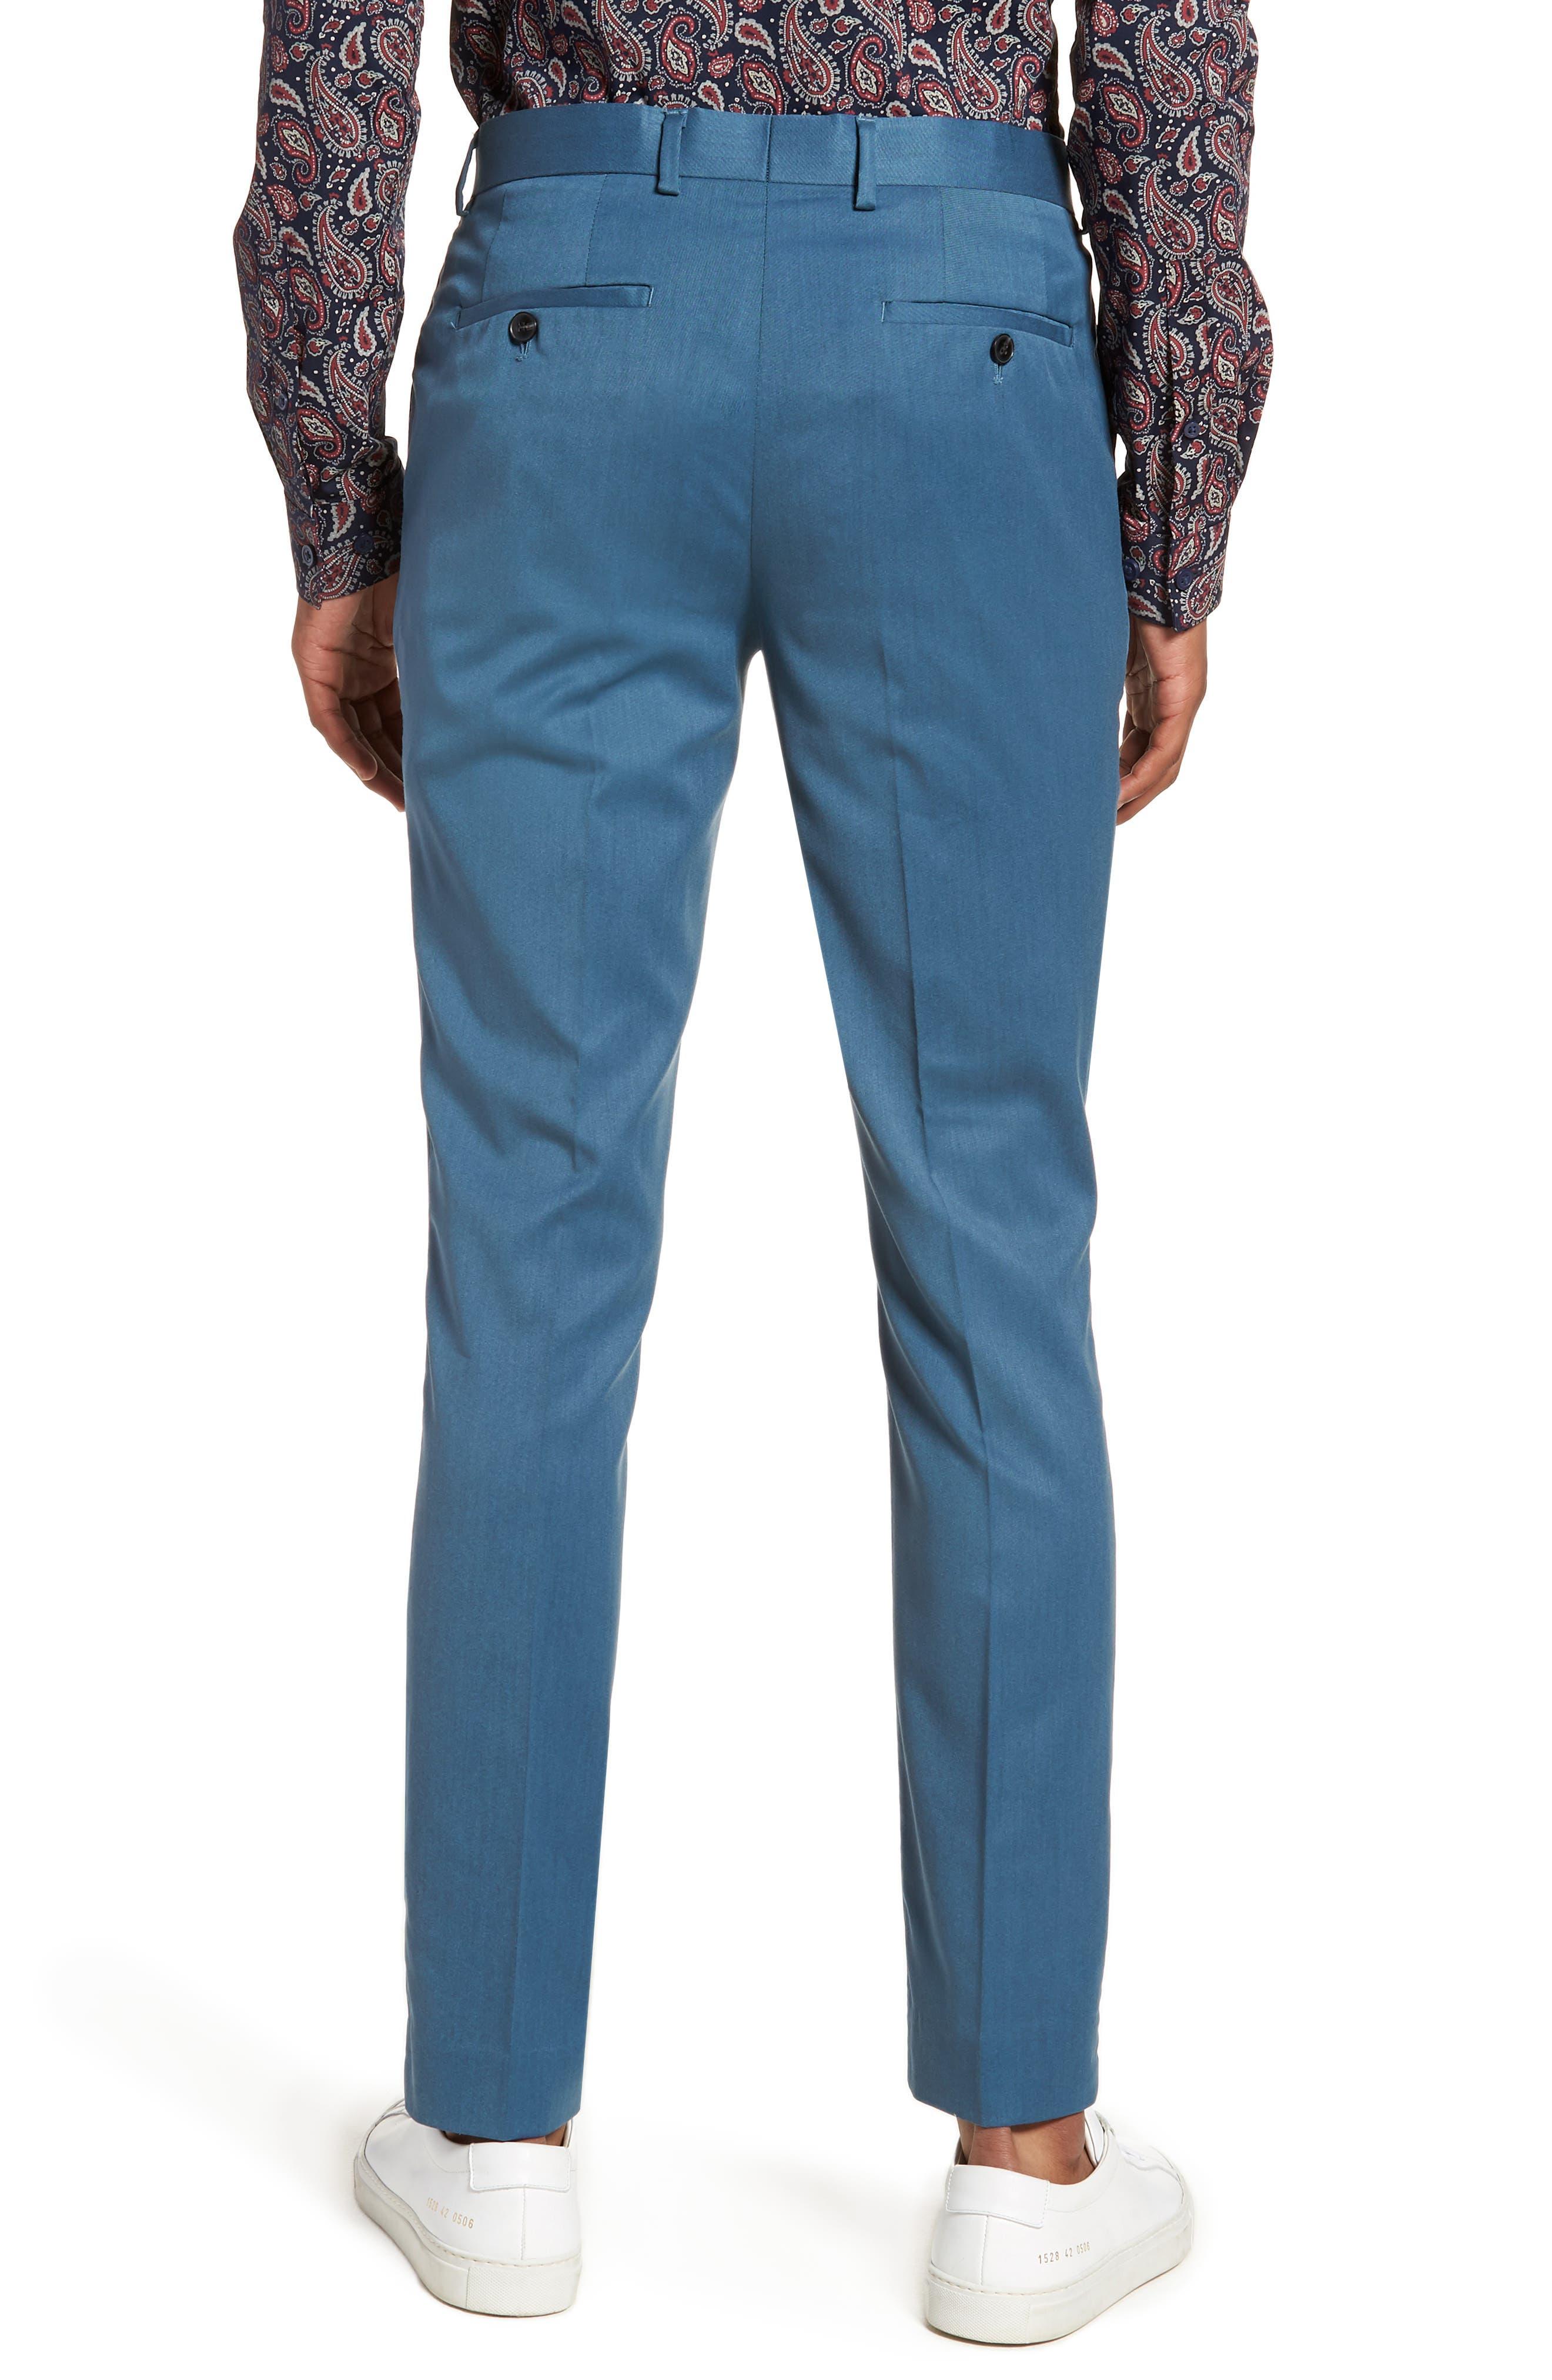 Skinny Fit Suit Trousers,                             Alternate thumbnail 2, color,                             Light Blue